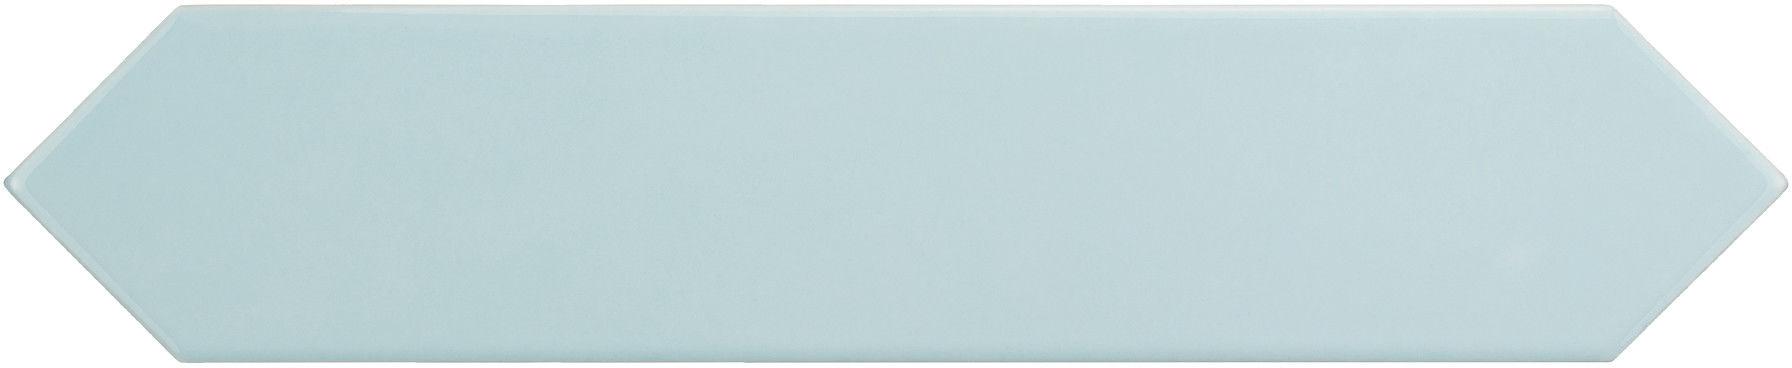 Arrow Caribbean Blue 5x25 płytka ścienna błękitna